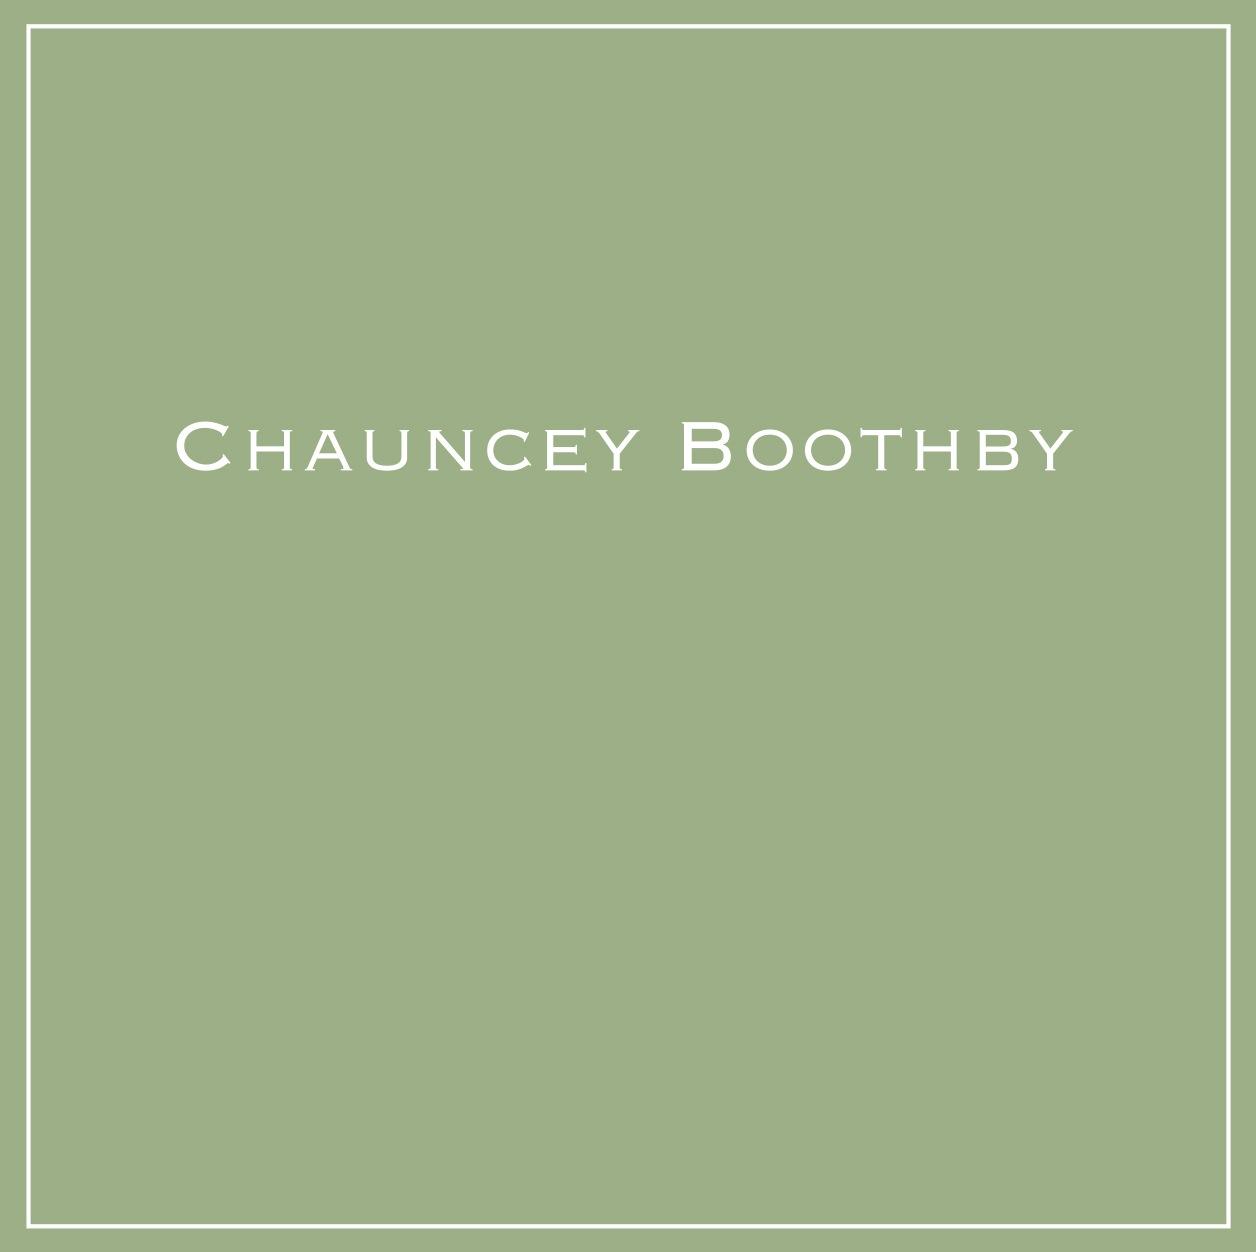 - chauncey@chaunceyboothby.comP. 774.232.1282